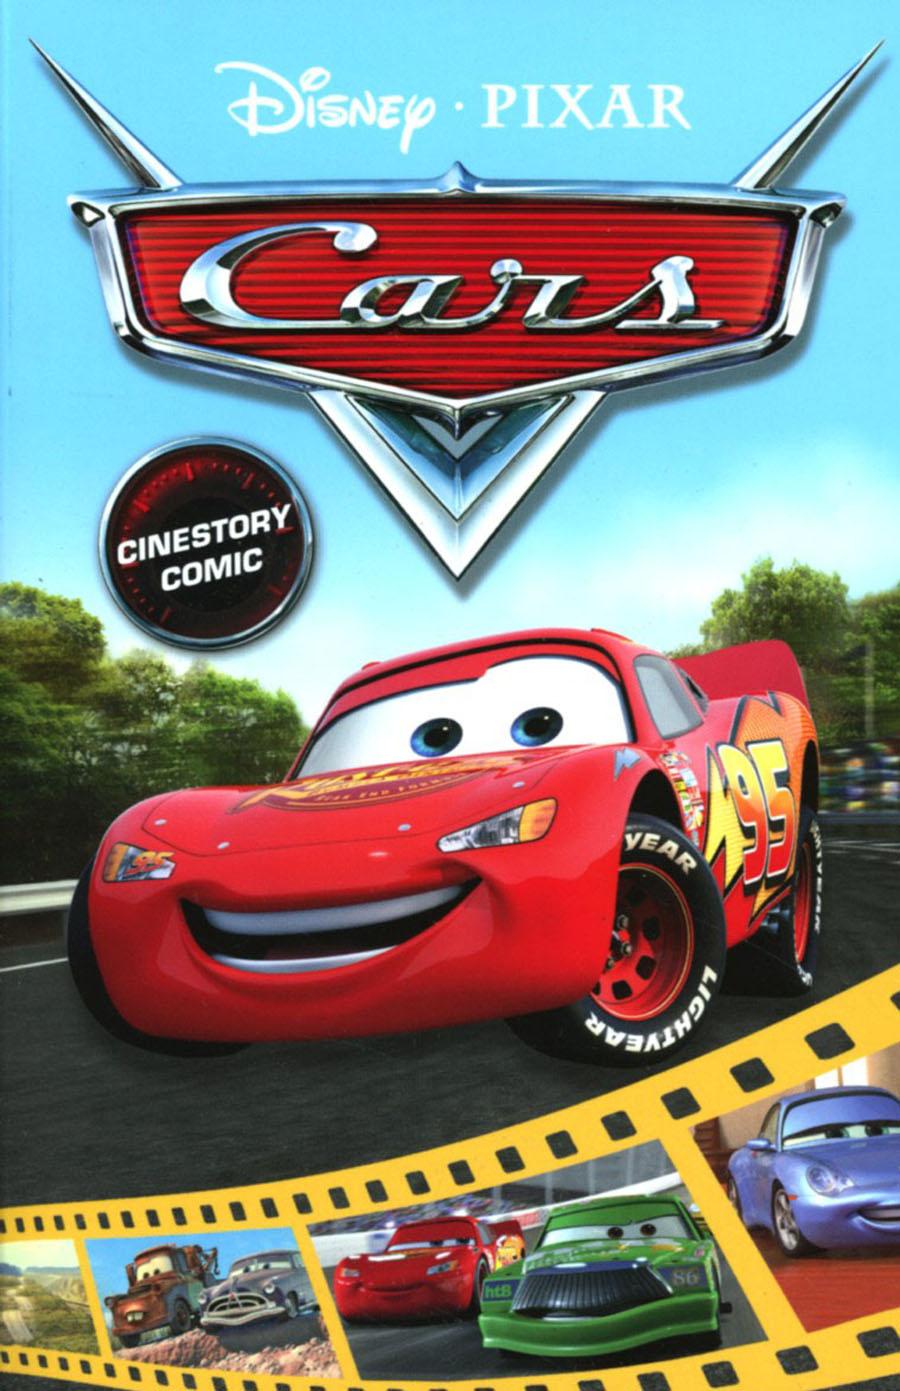 Disney Pixar Cars Cinestory Comic TP